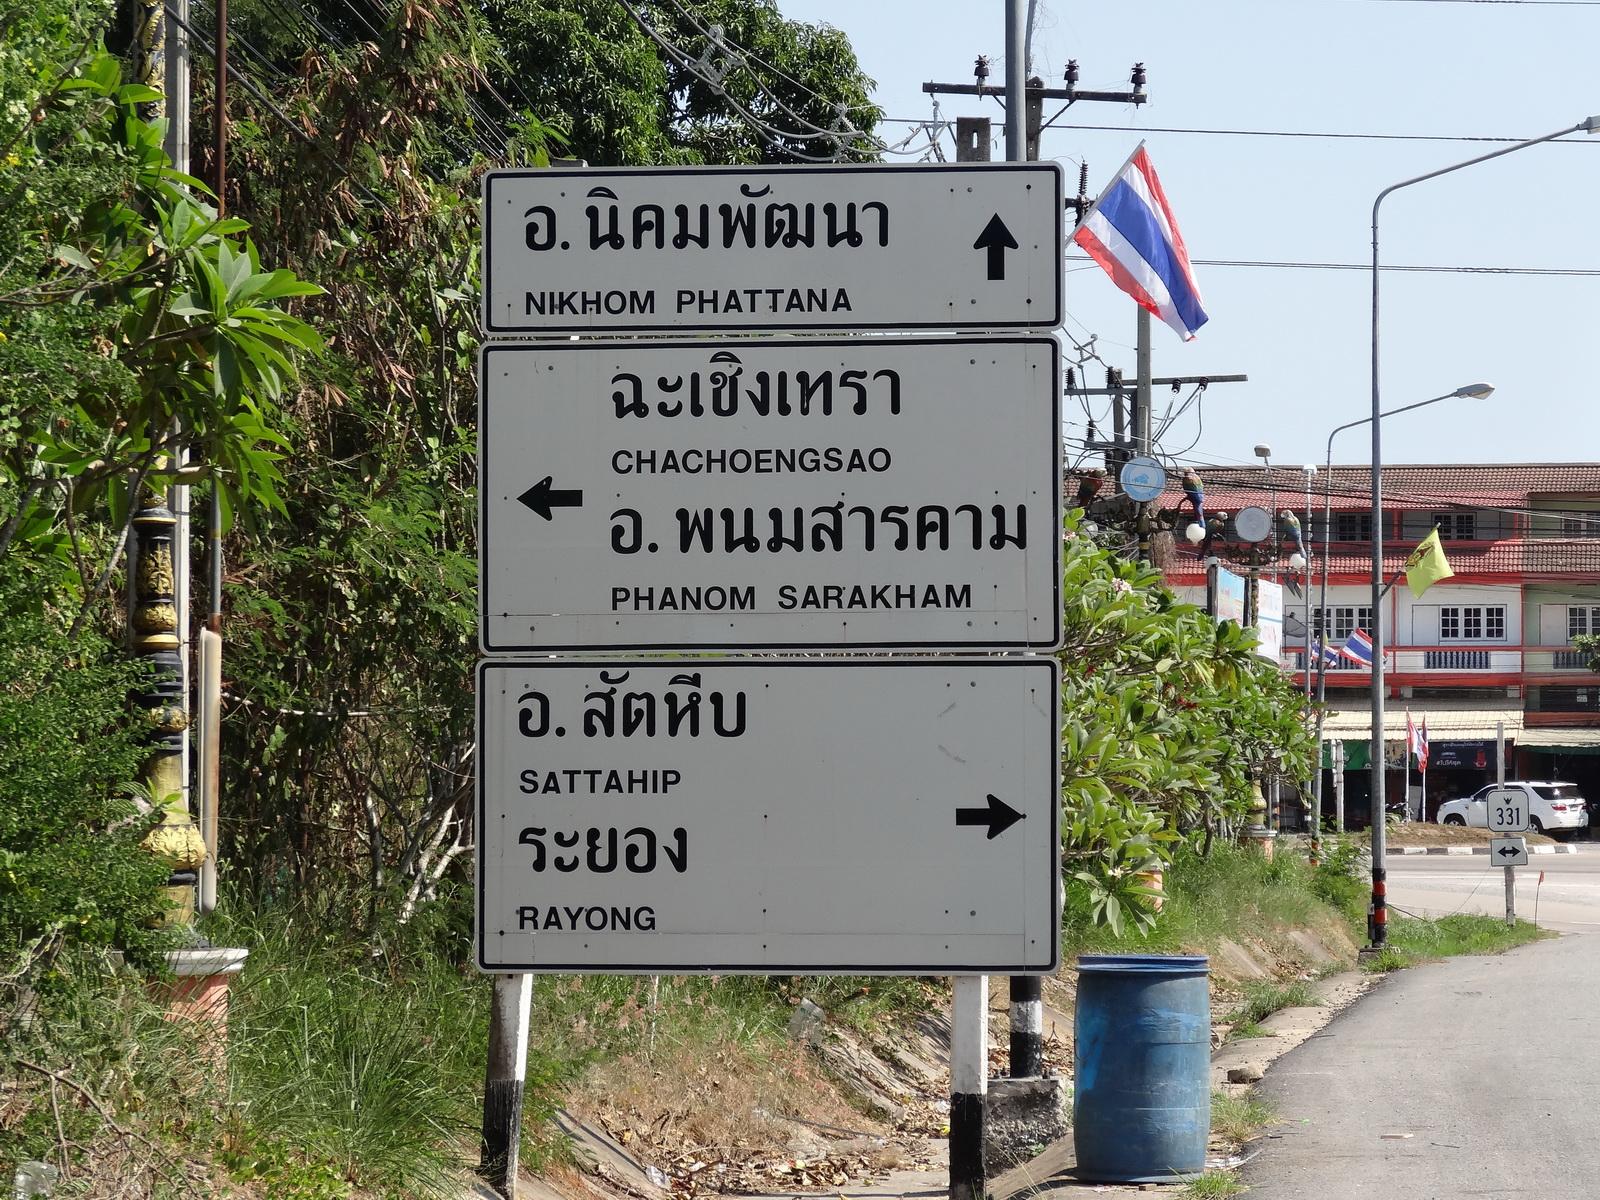 07 Pattaya 123